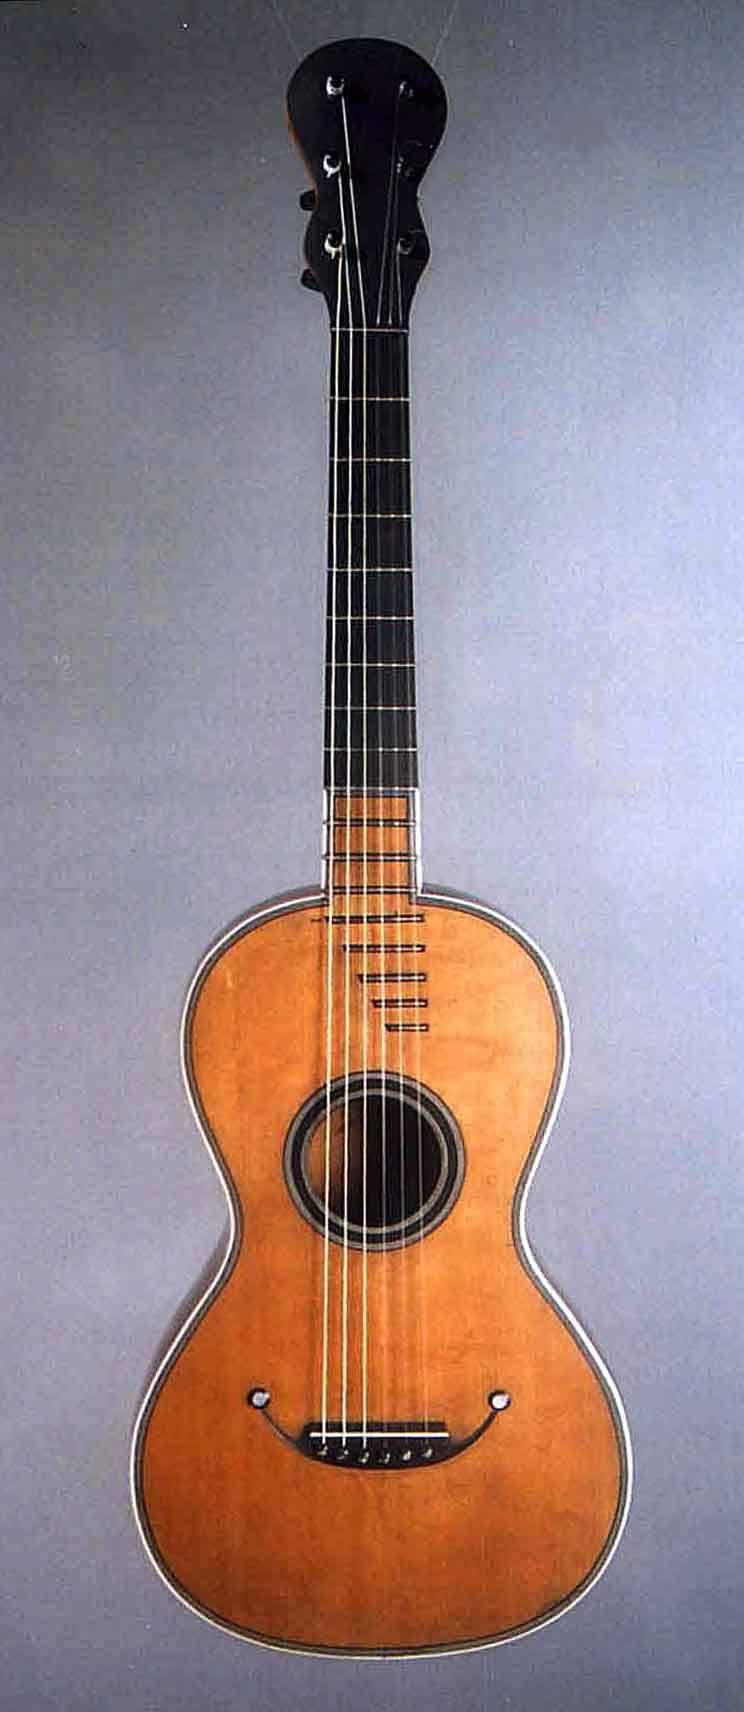 Cabasse-Bernard guitar c1820